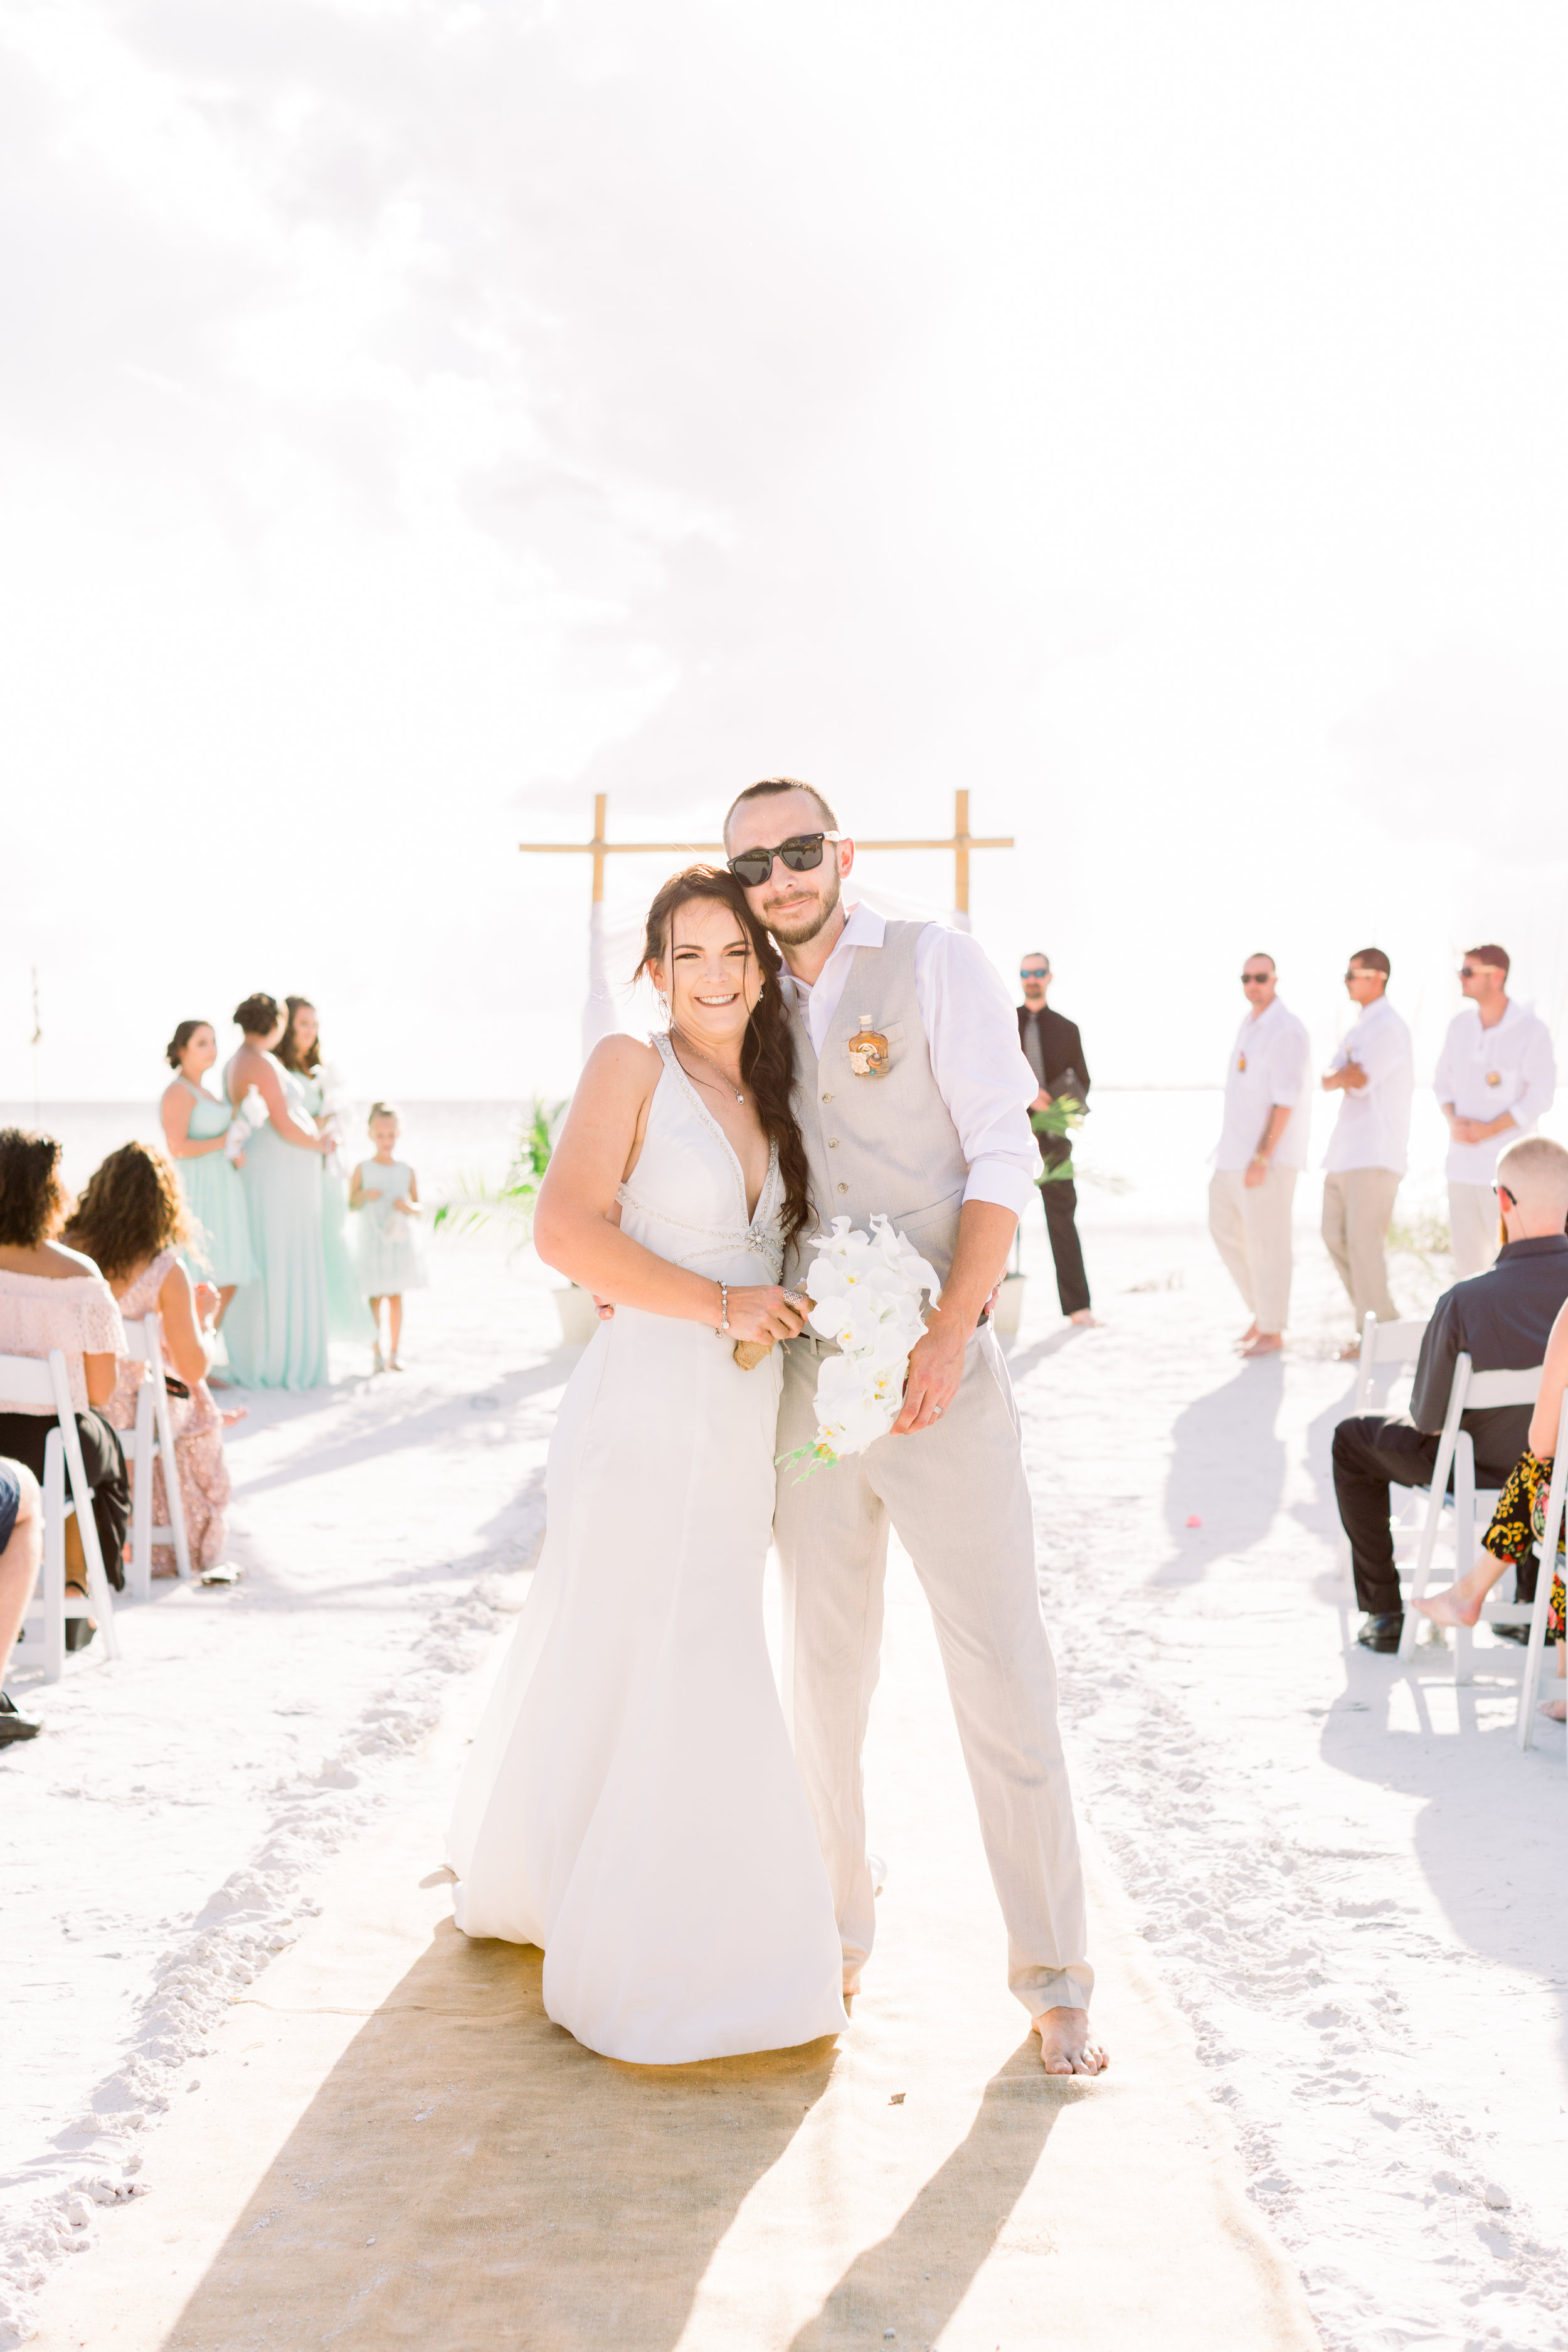 wedding photographer in Naples Florida. Destination, travel, luxury, beach wedding. florida, georgia. Fort Myers, cape coral, bonita springs, captiva, sanibel, marco island, elopement, hyatt, the ritz, laplaya, the Ringlind, sarasota